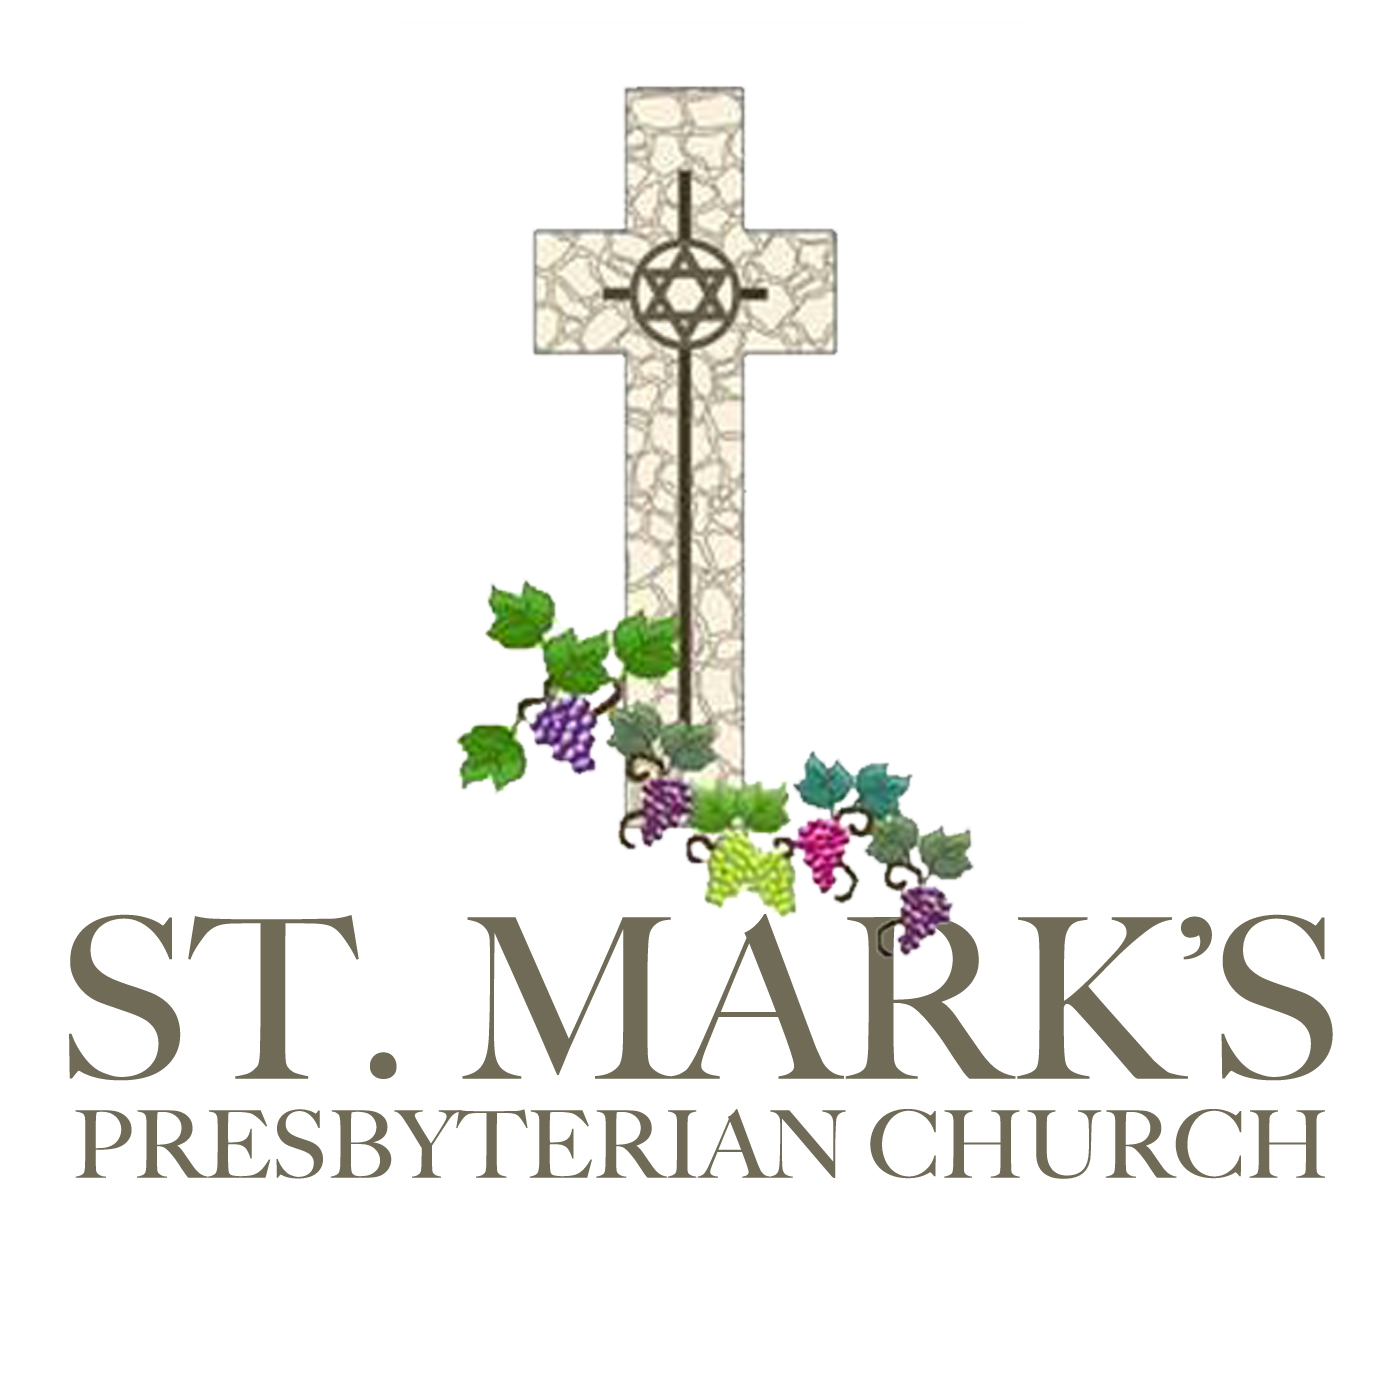 St. Mark's Presbyterian Church